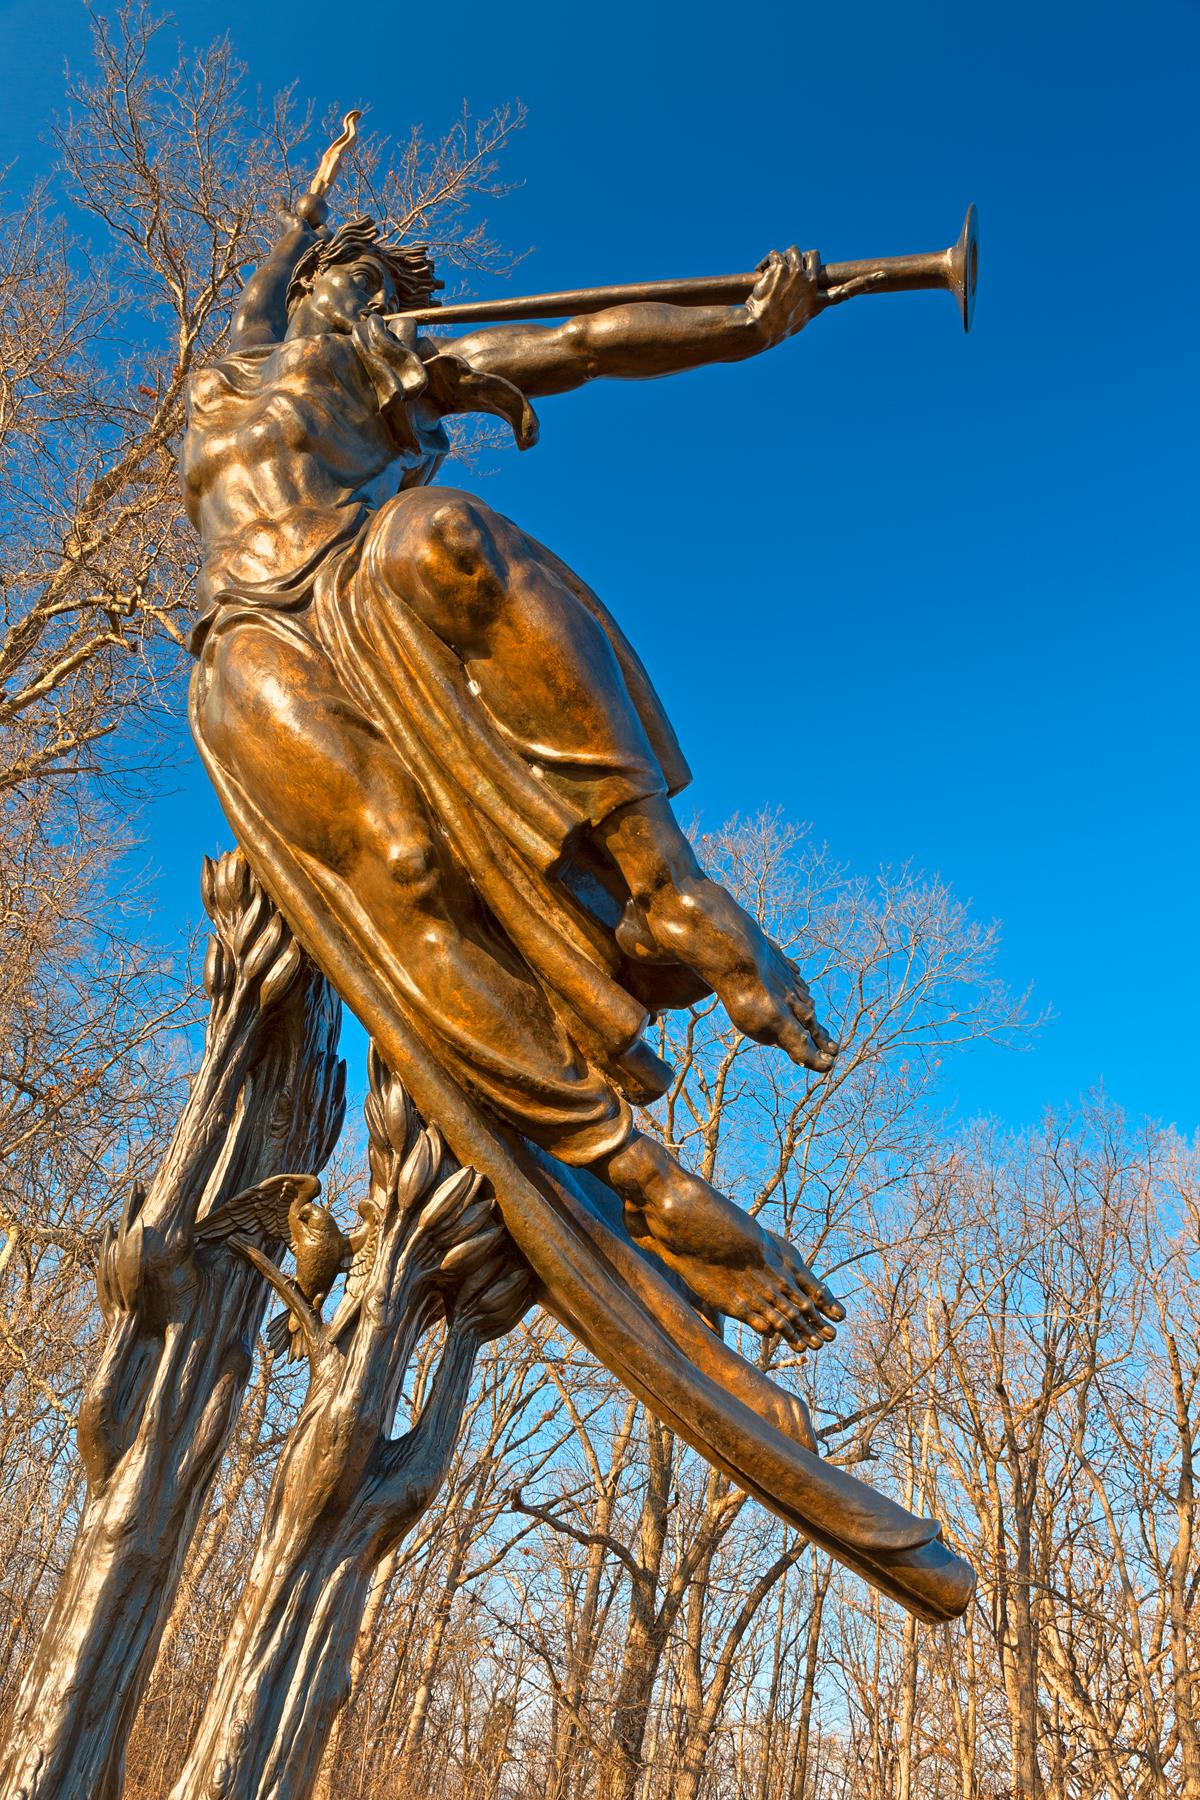 Golden Spirit of Louisiana - HDR, Age, Peace, Sculpture, Scene, HQ Photo